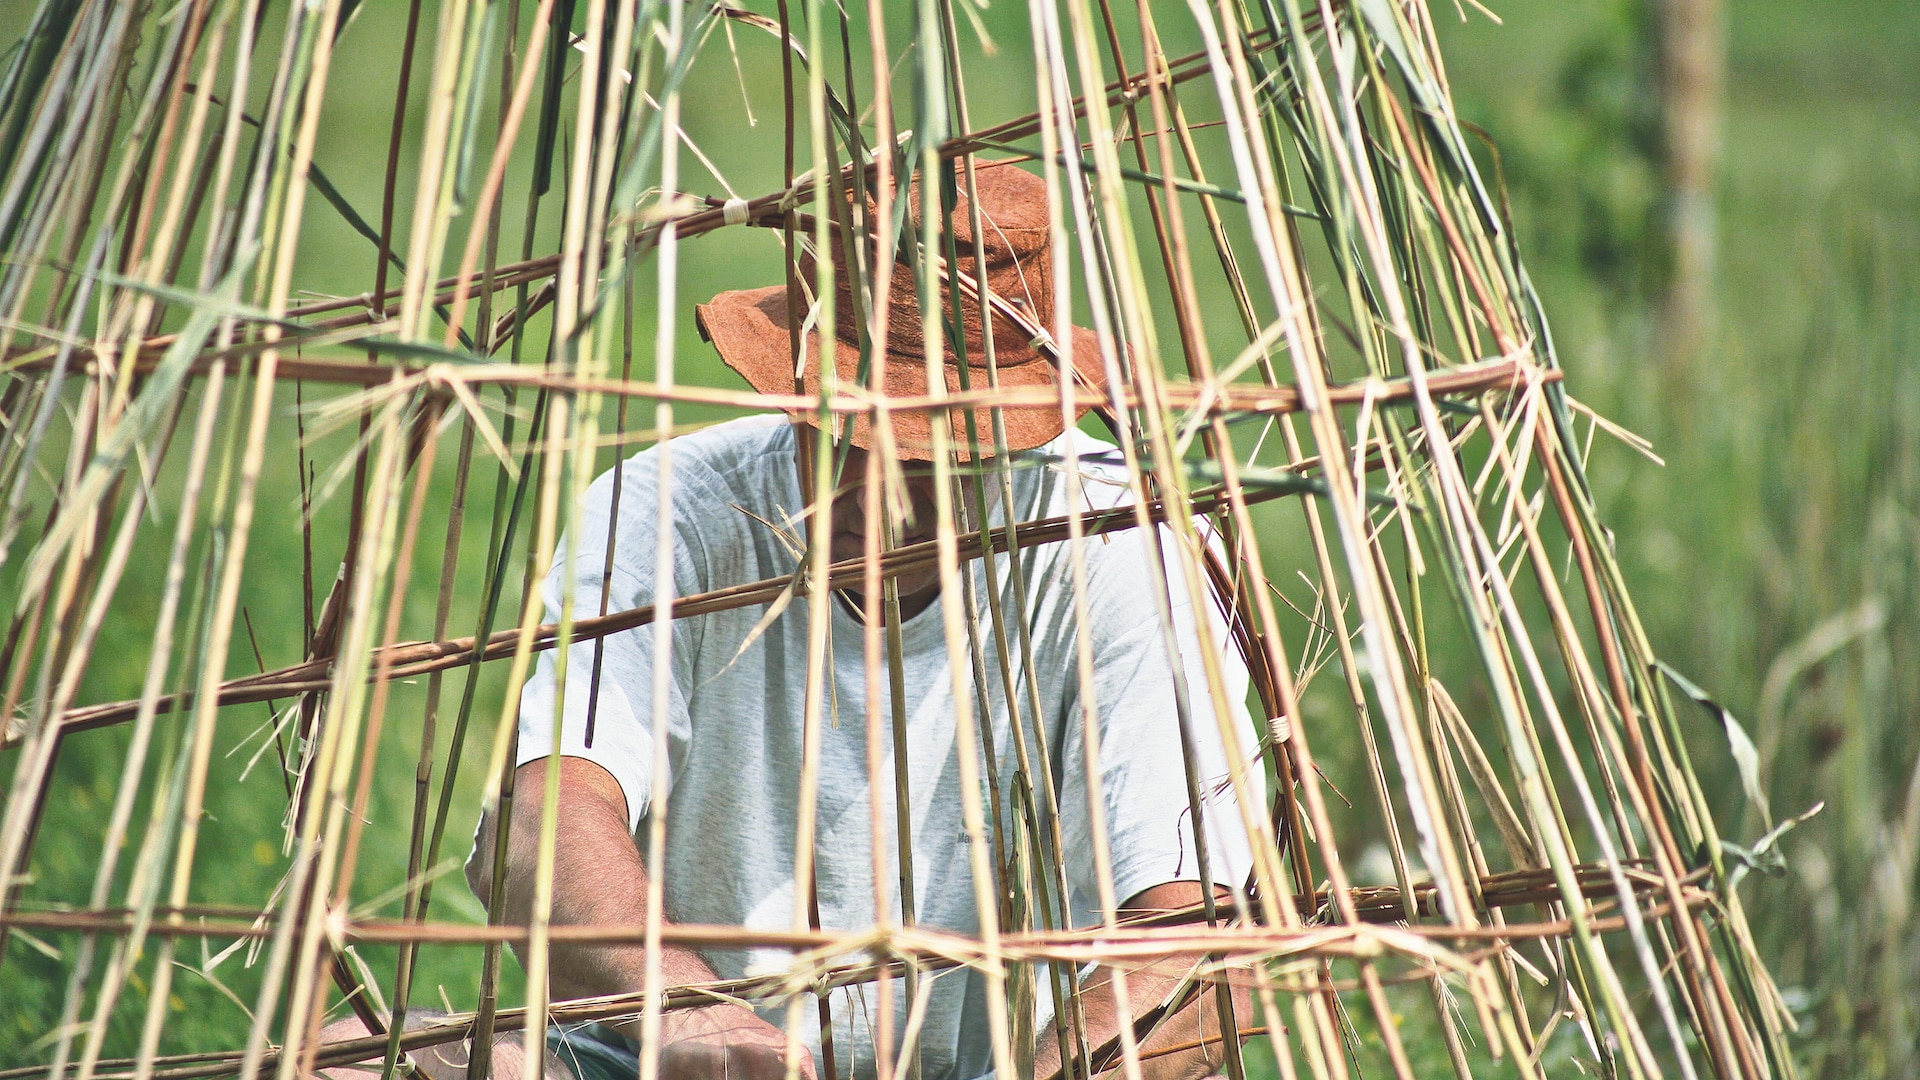 Land Art bamboo and swamp Alejandro Guzzetti